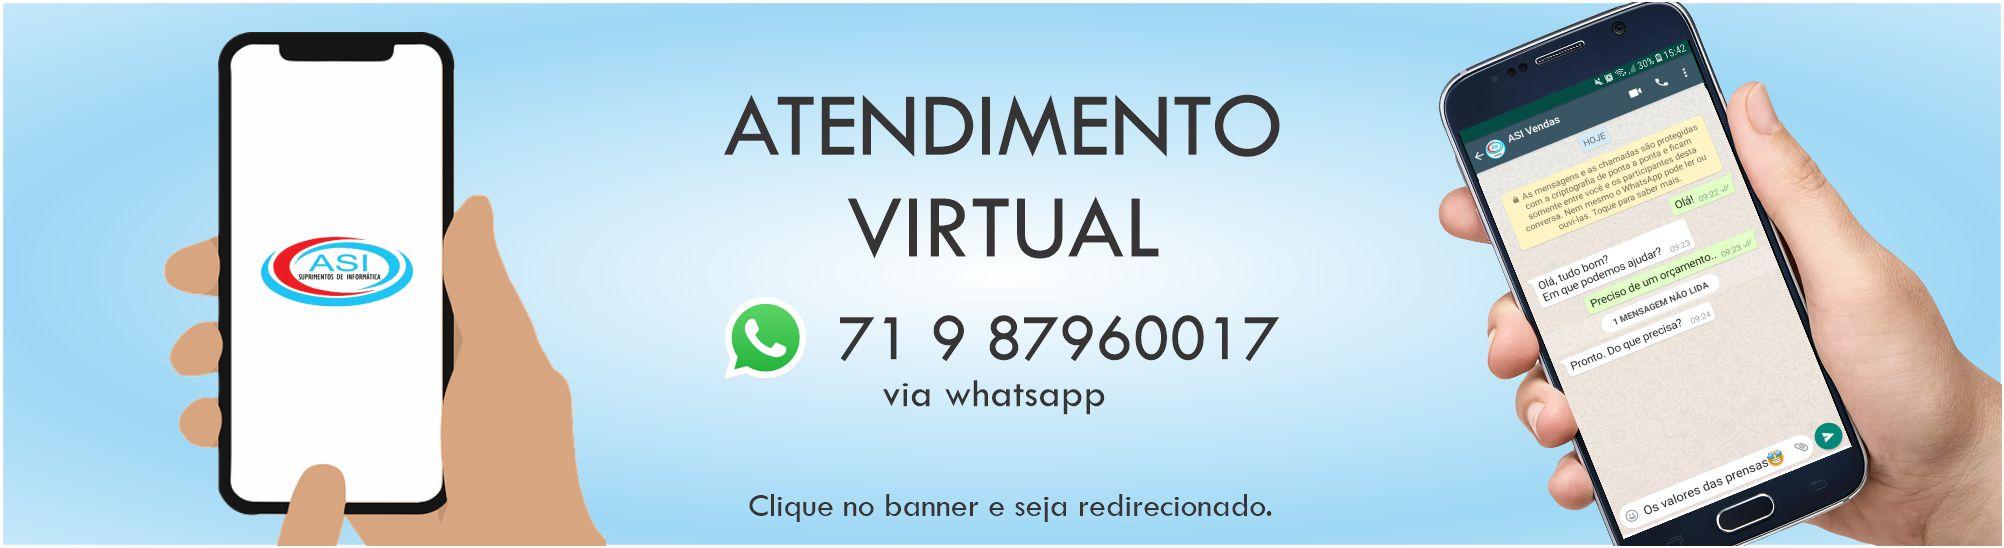 Atendimento Virtual ASI